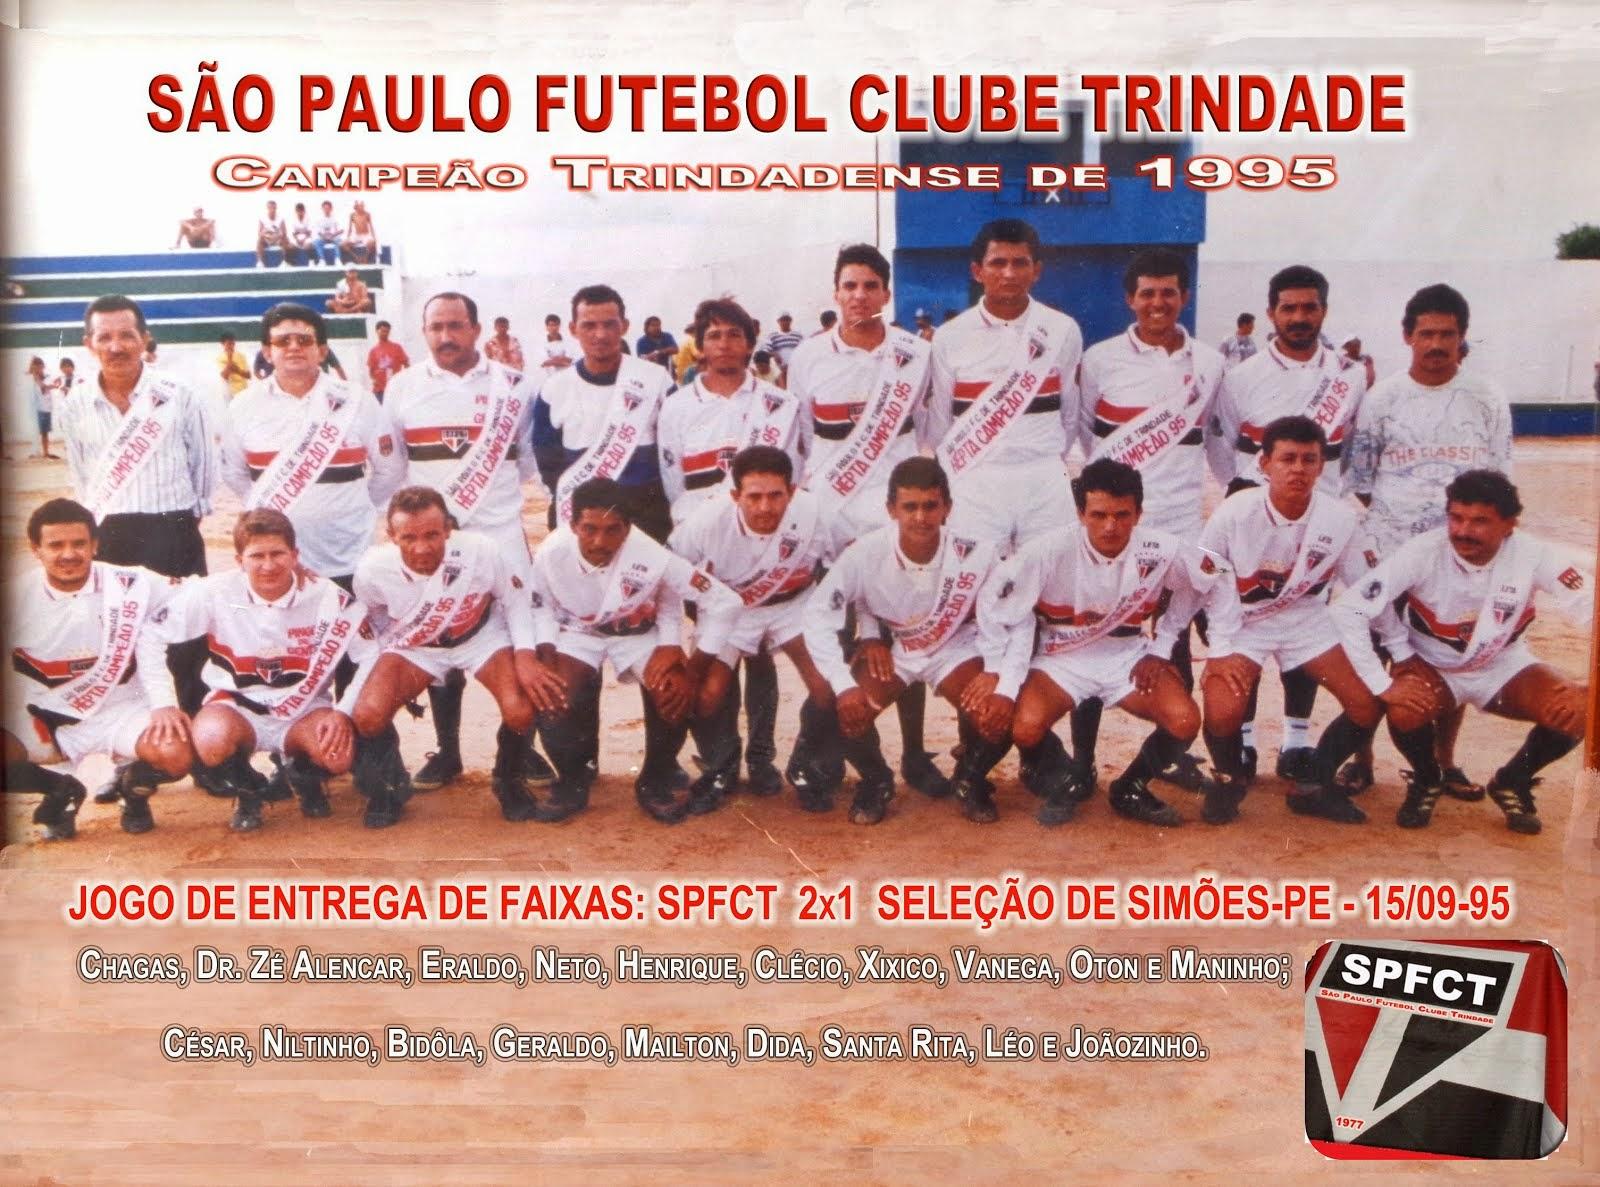 SÃO PAULO F. C. T.